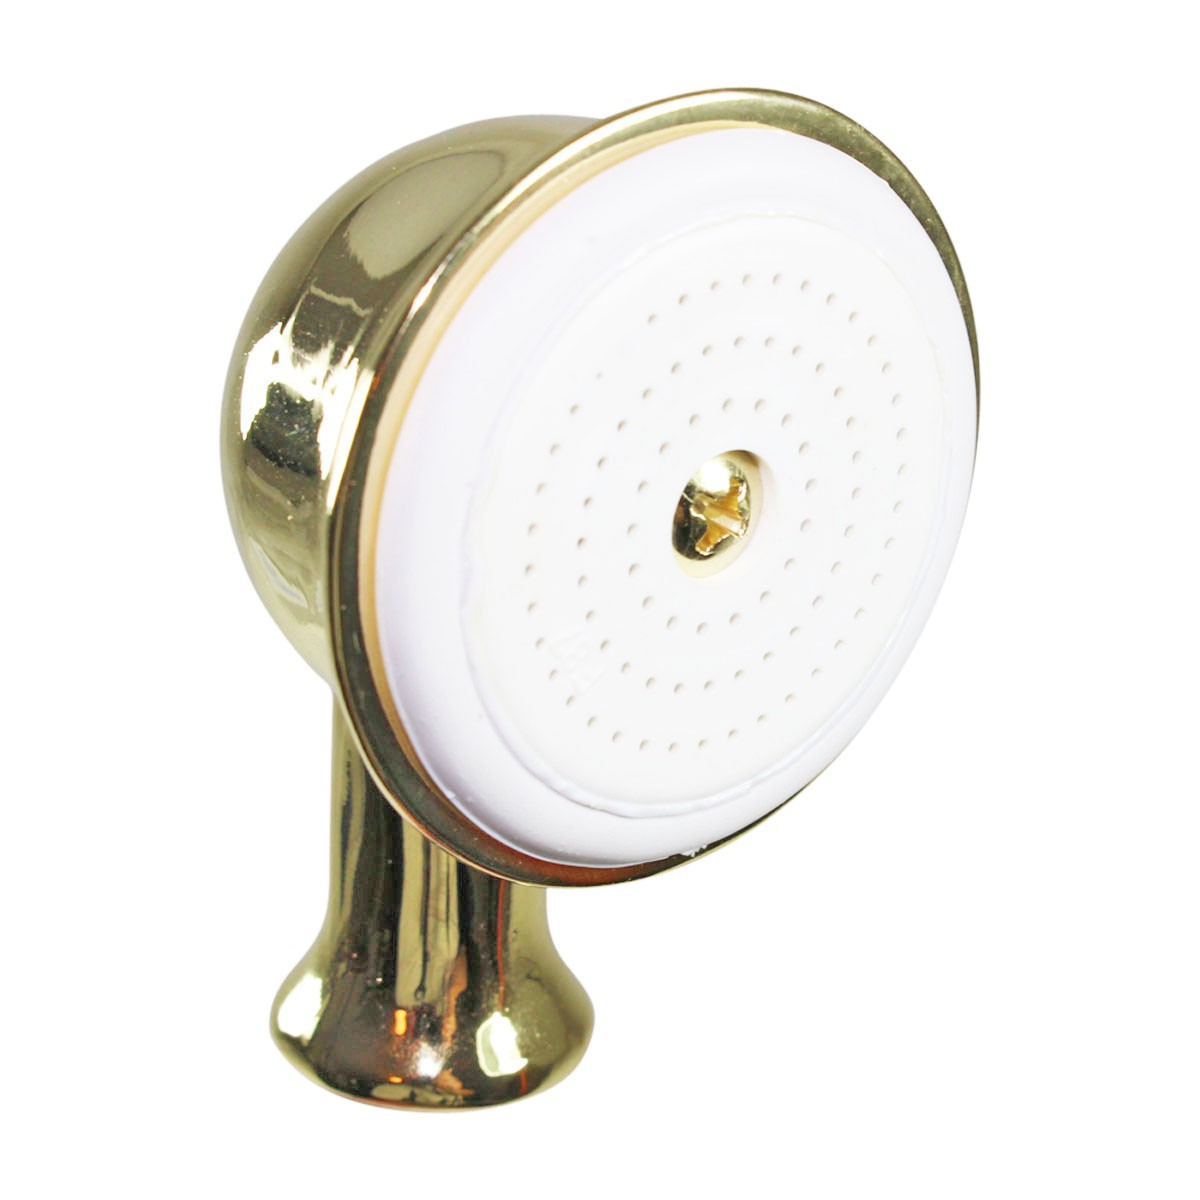 Handheld Shower Bright Brass Wall Mount 1 Handle Hand Held Shower Hand Held Showers Handheld Showers